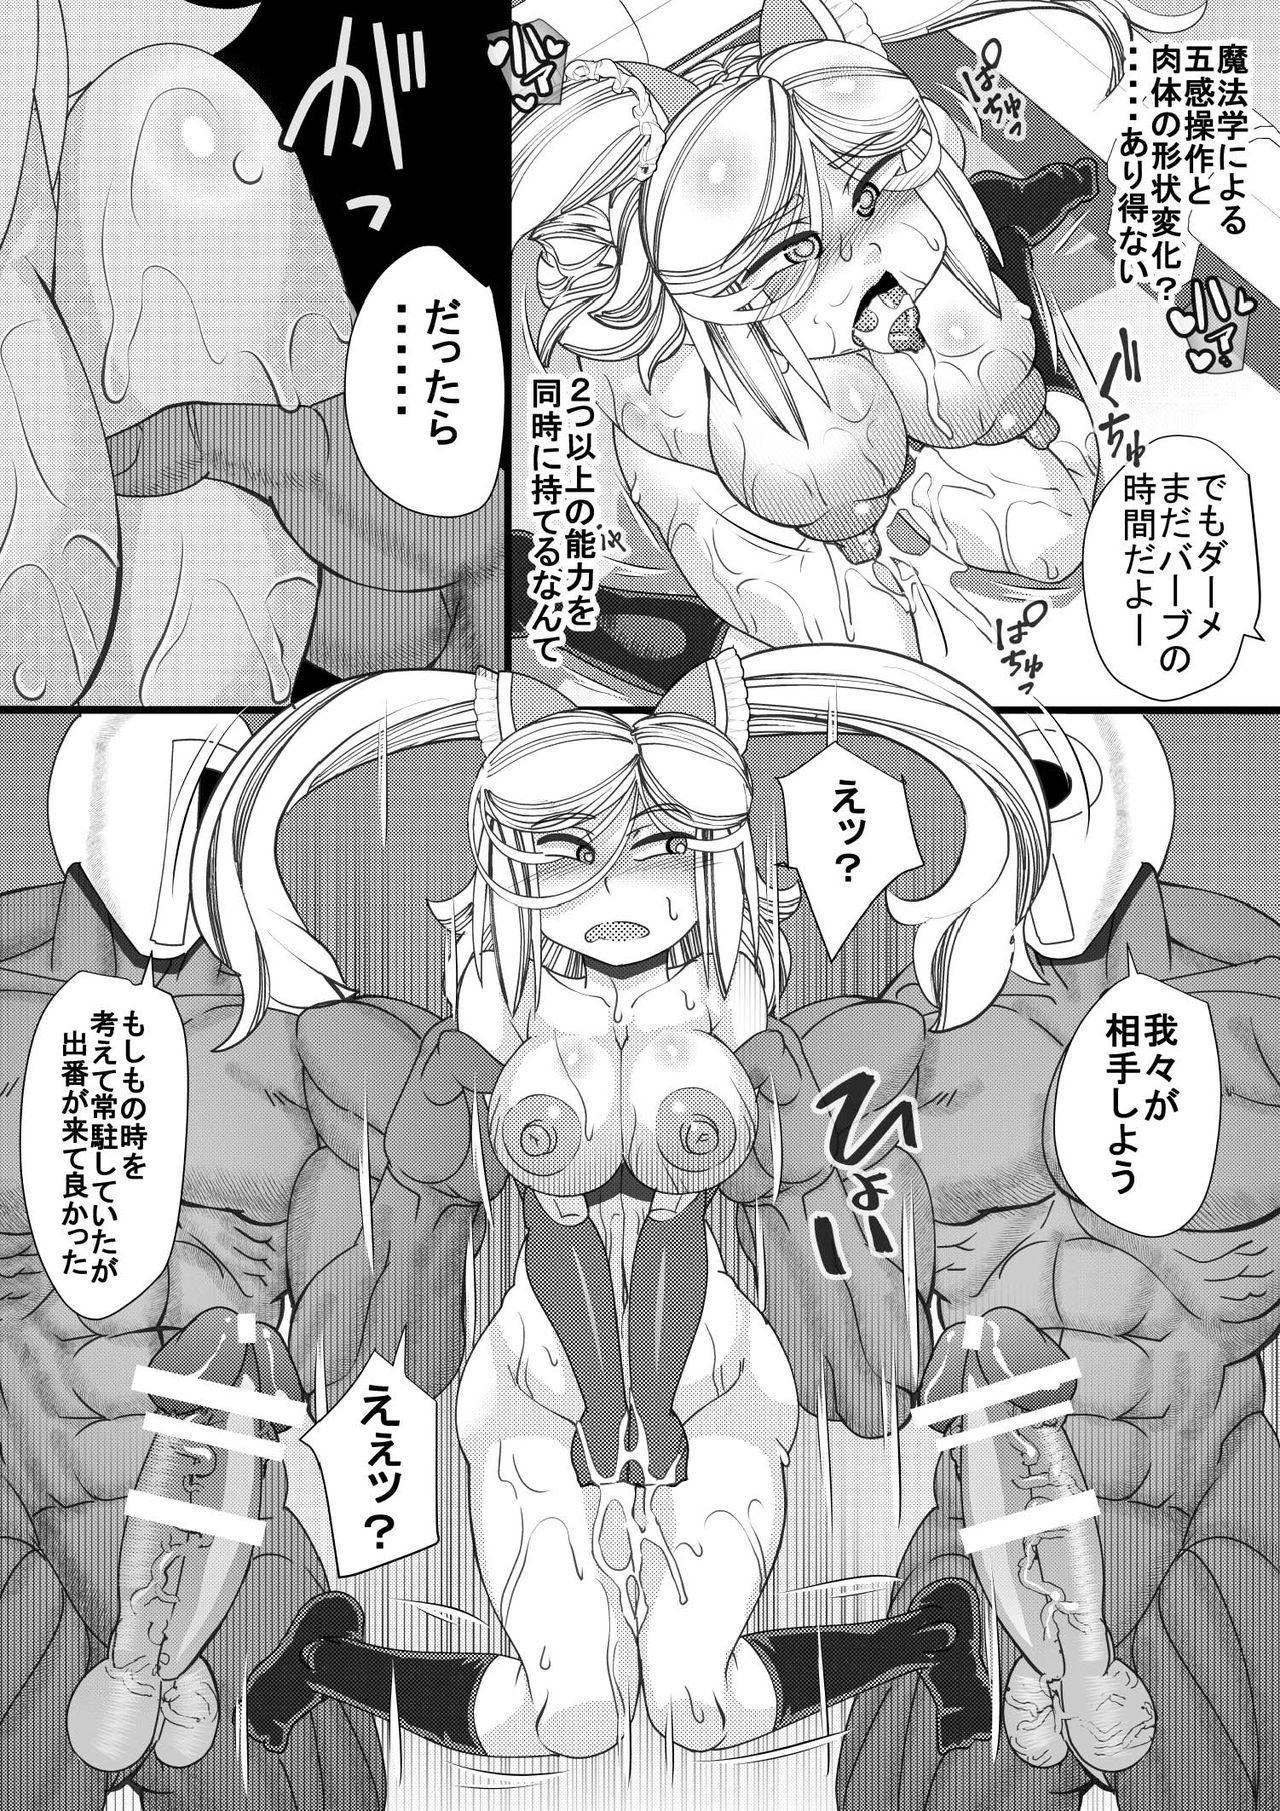 Haramachi 9 24